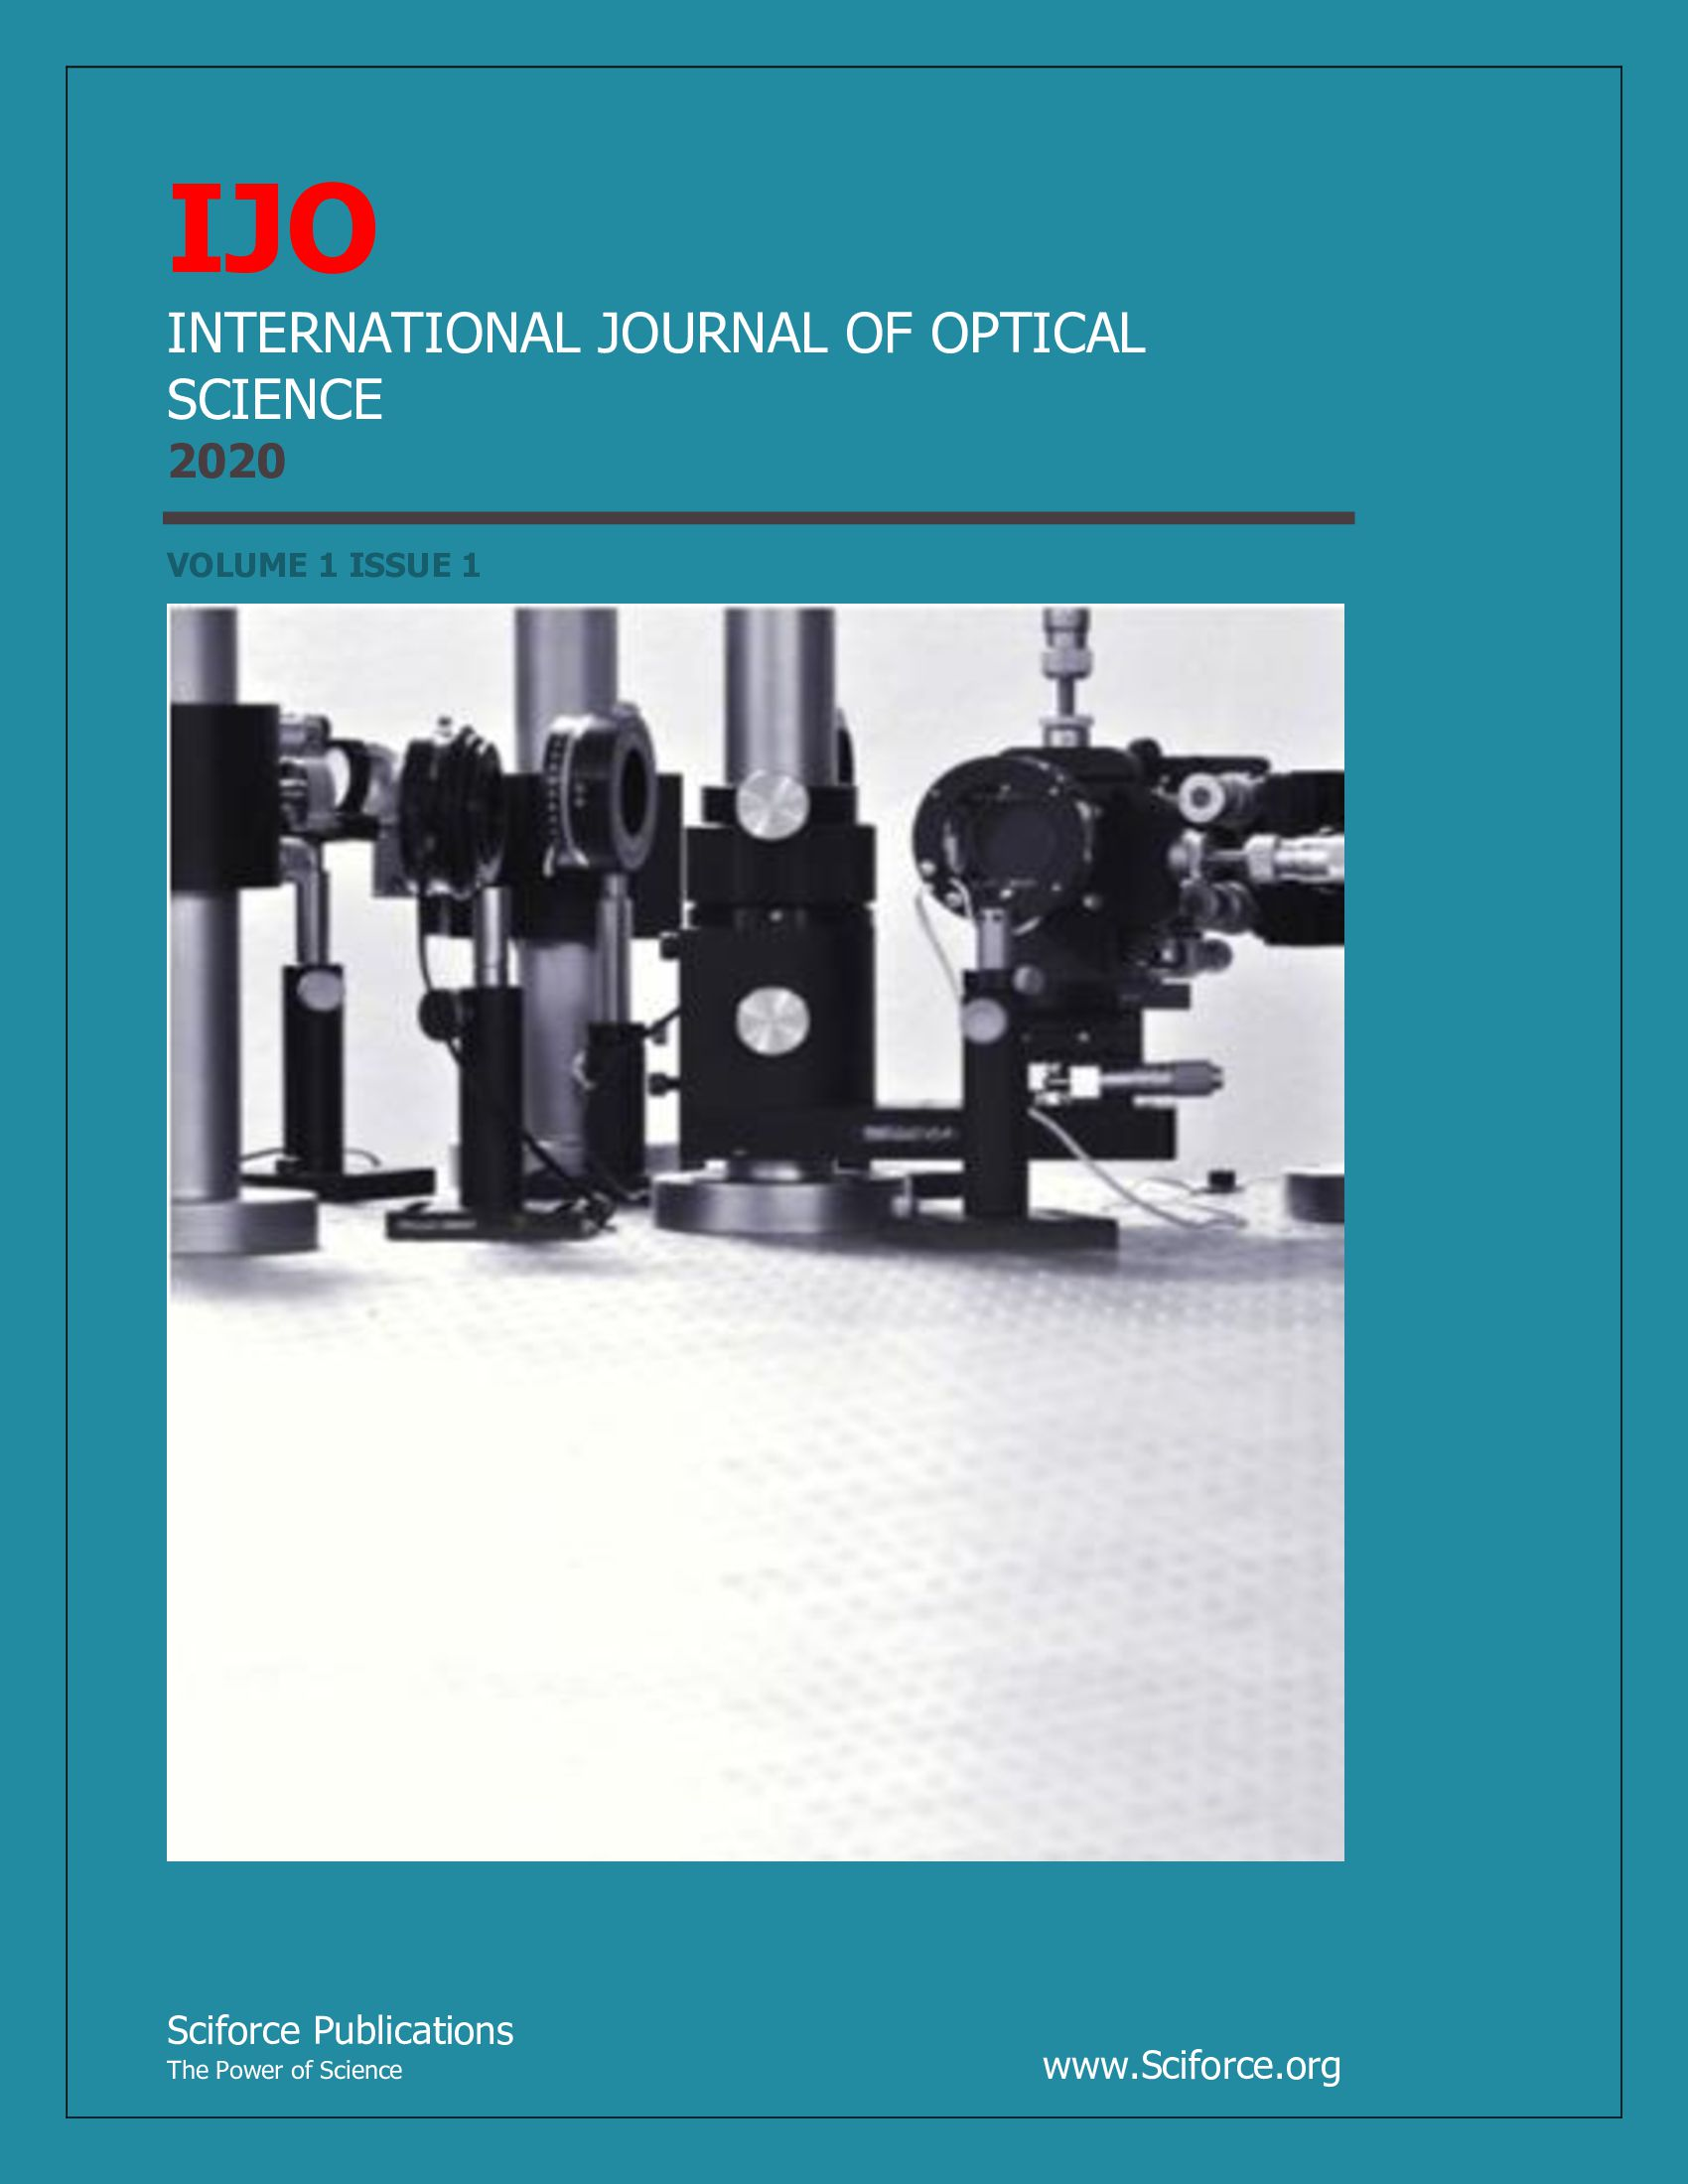 International Journal of Optical Science